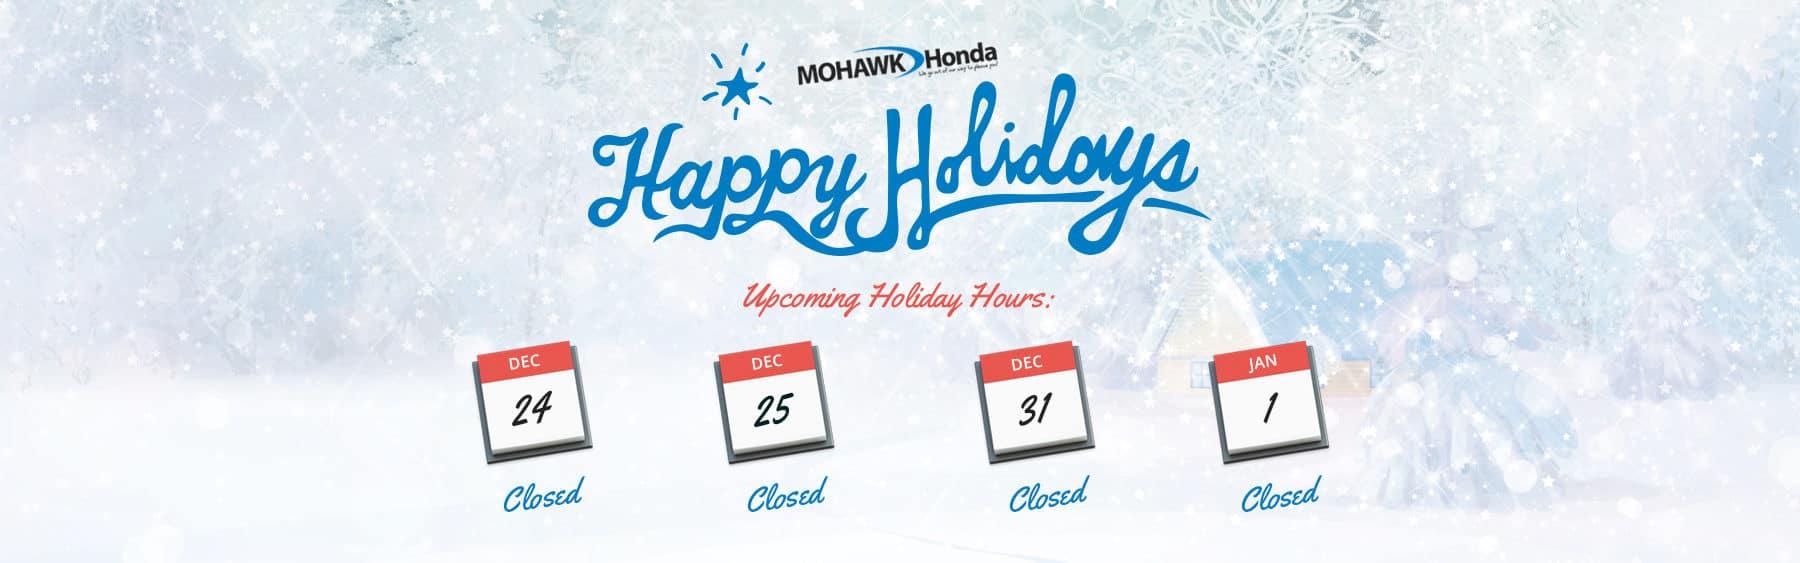 Honda dealer in scotia ny mohawk honda for Honda dealership hours